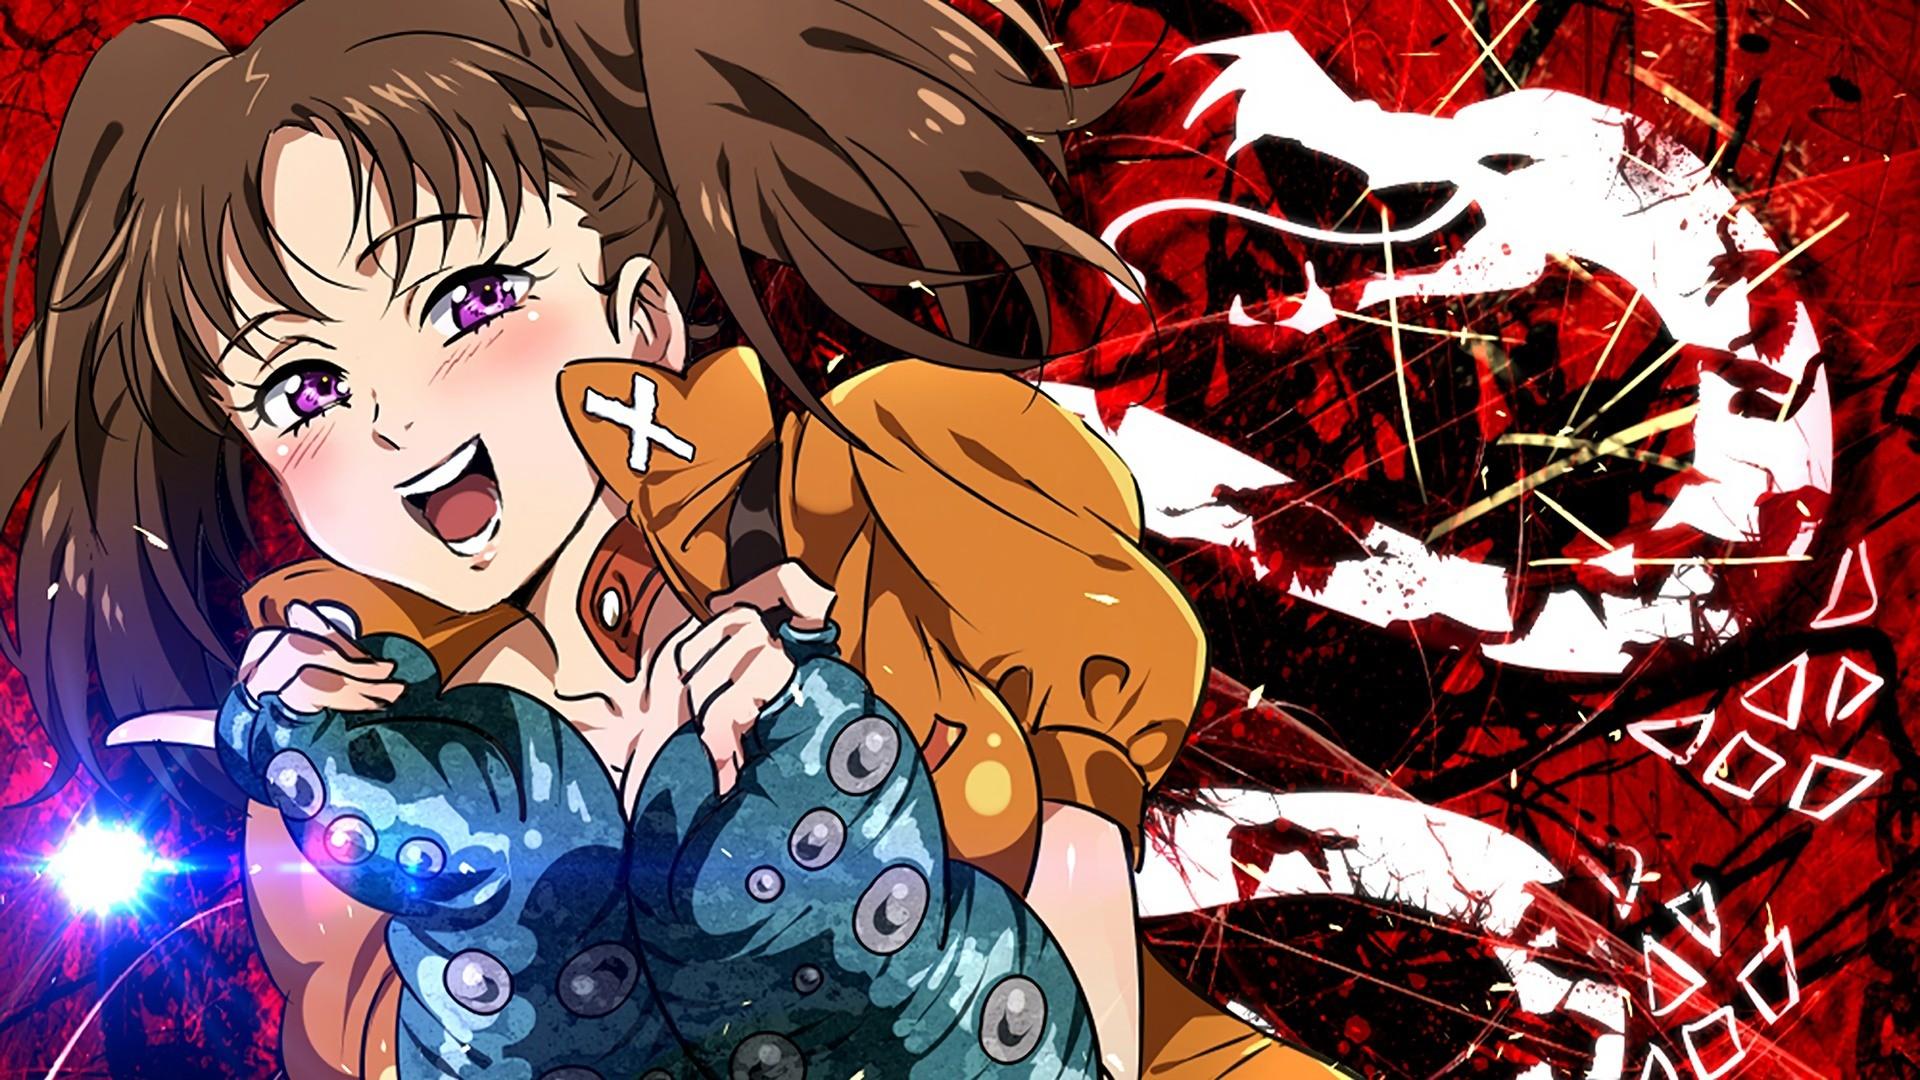 Diane Seven Deadly Sins Anime Girl Wallpaper #2367